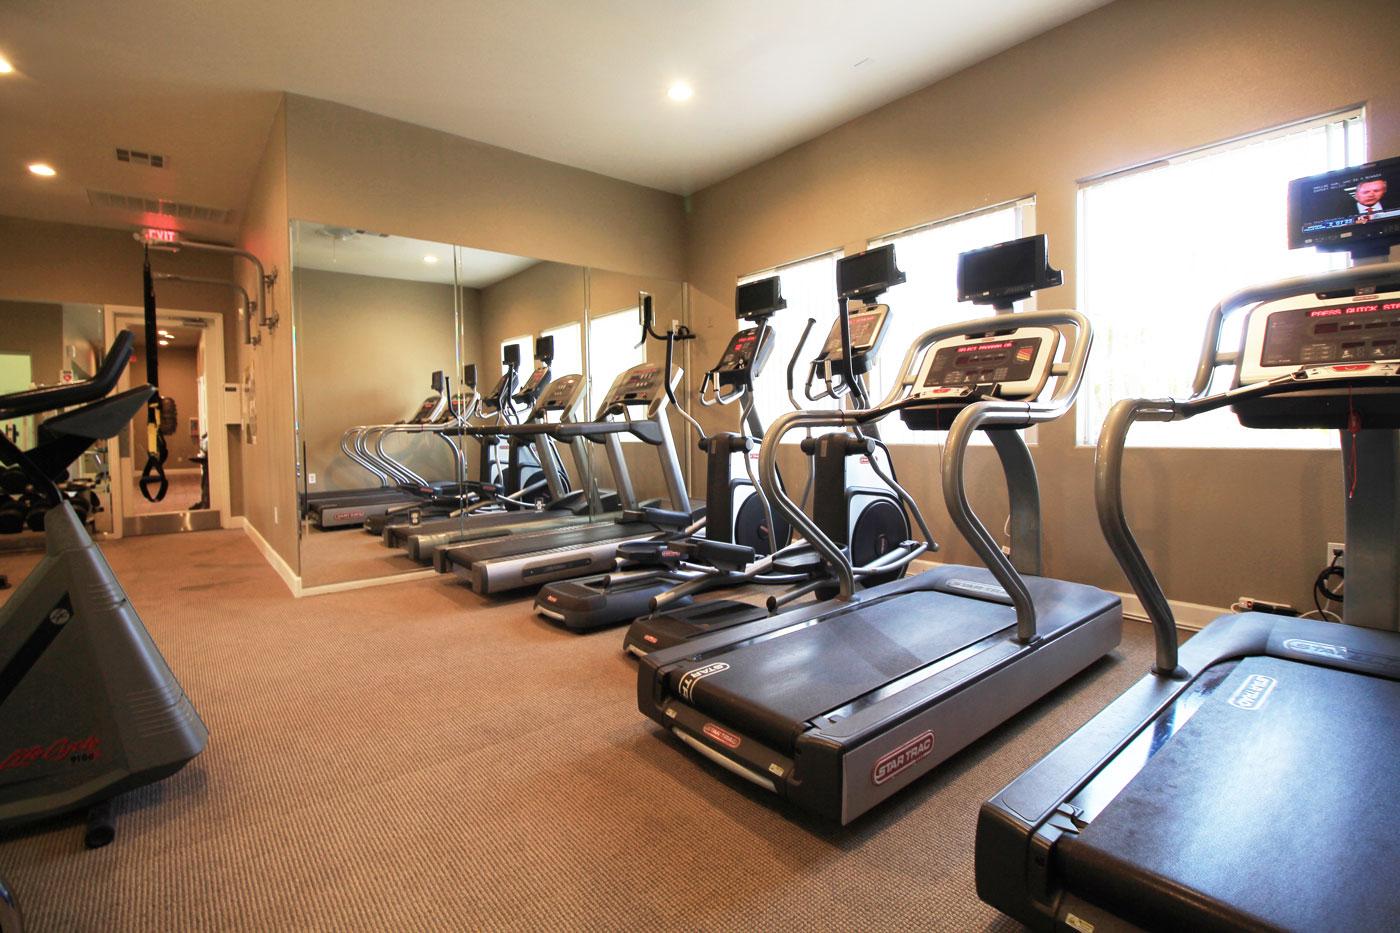 View of treadmills